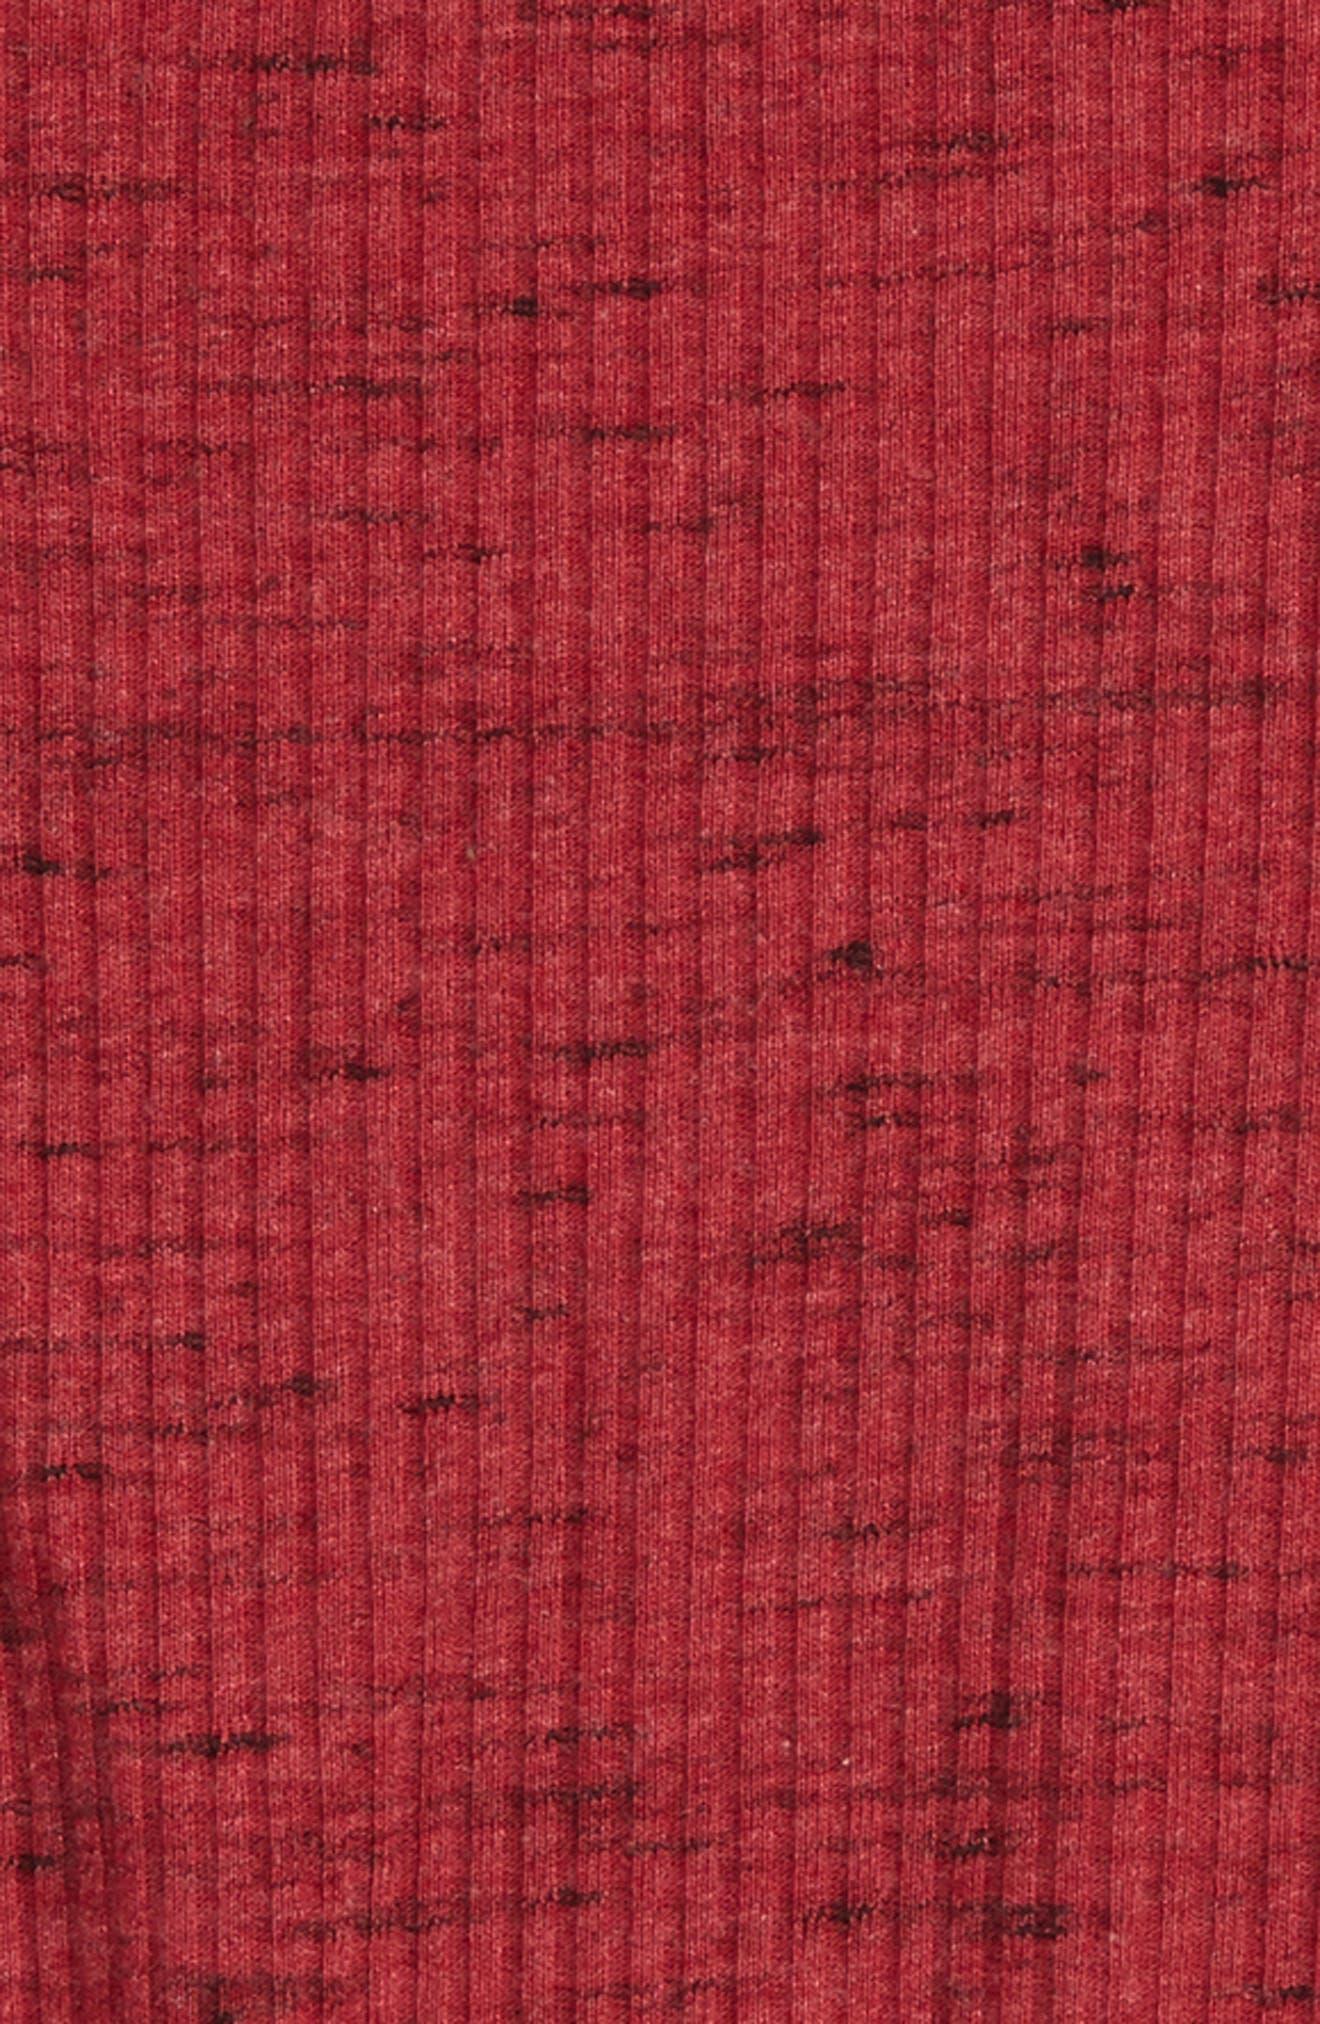 Cutout Rib Knit Tee,                             Alternate thumbnail 2, color,                             601